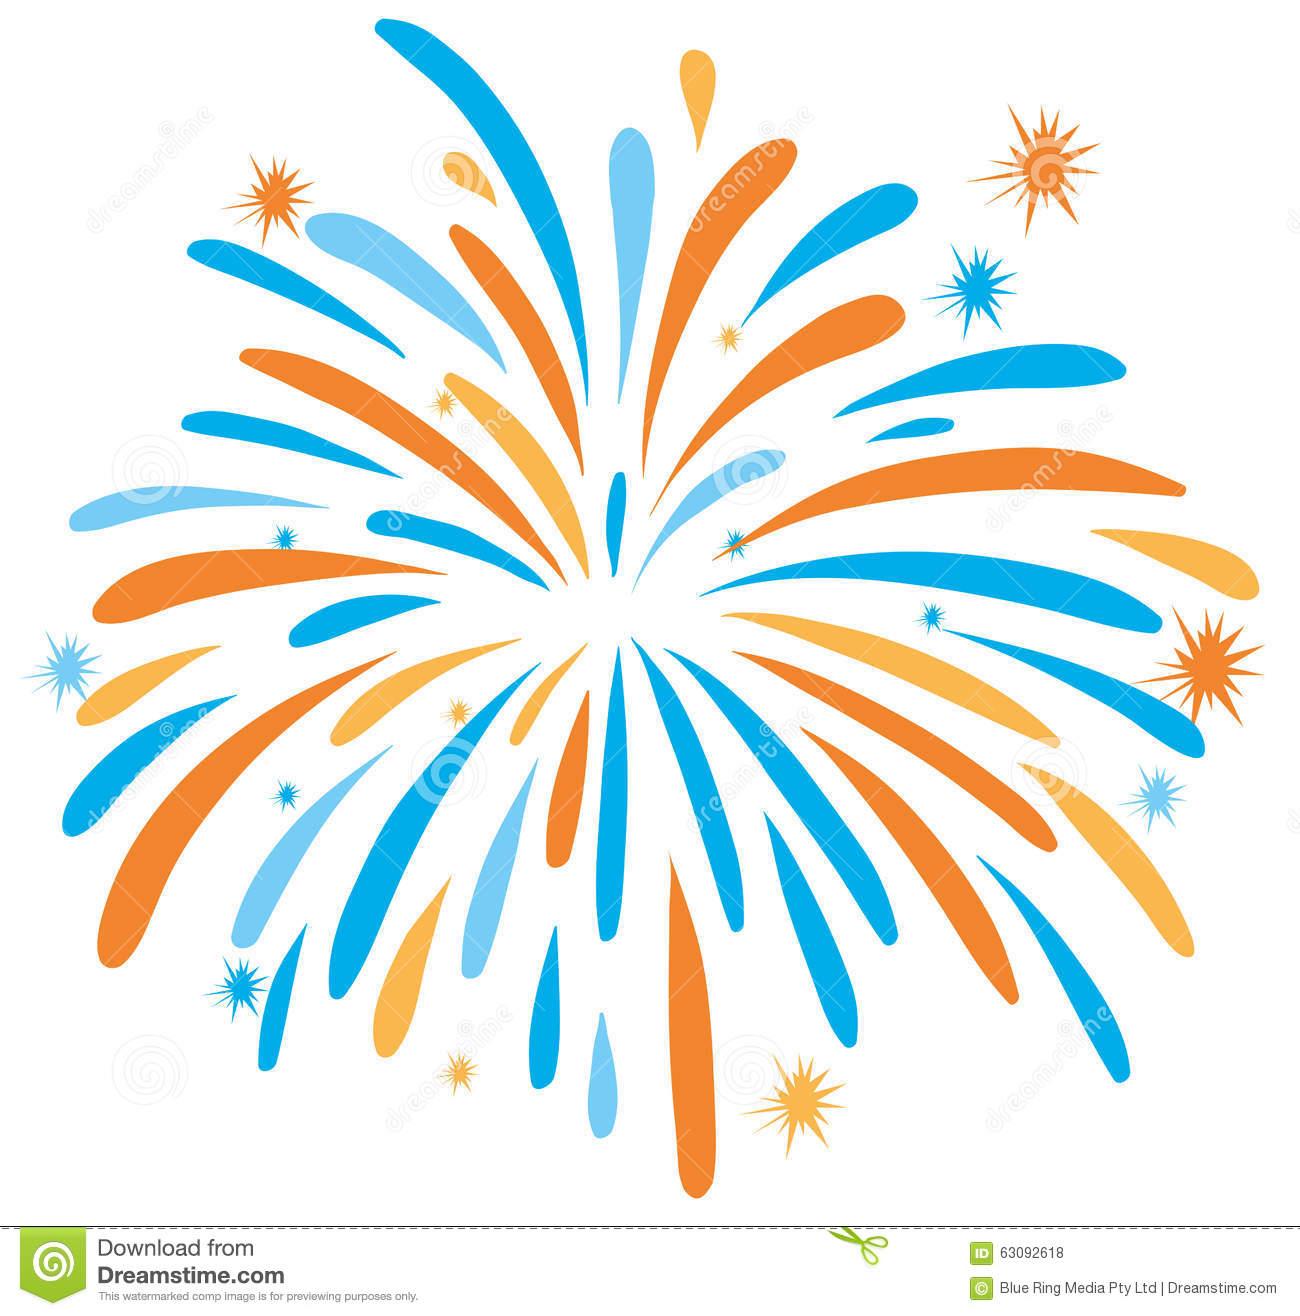 hight resolution of 1300x1316 fireworks clipart orange